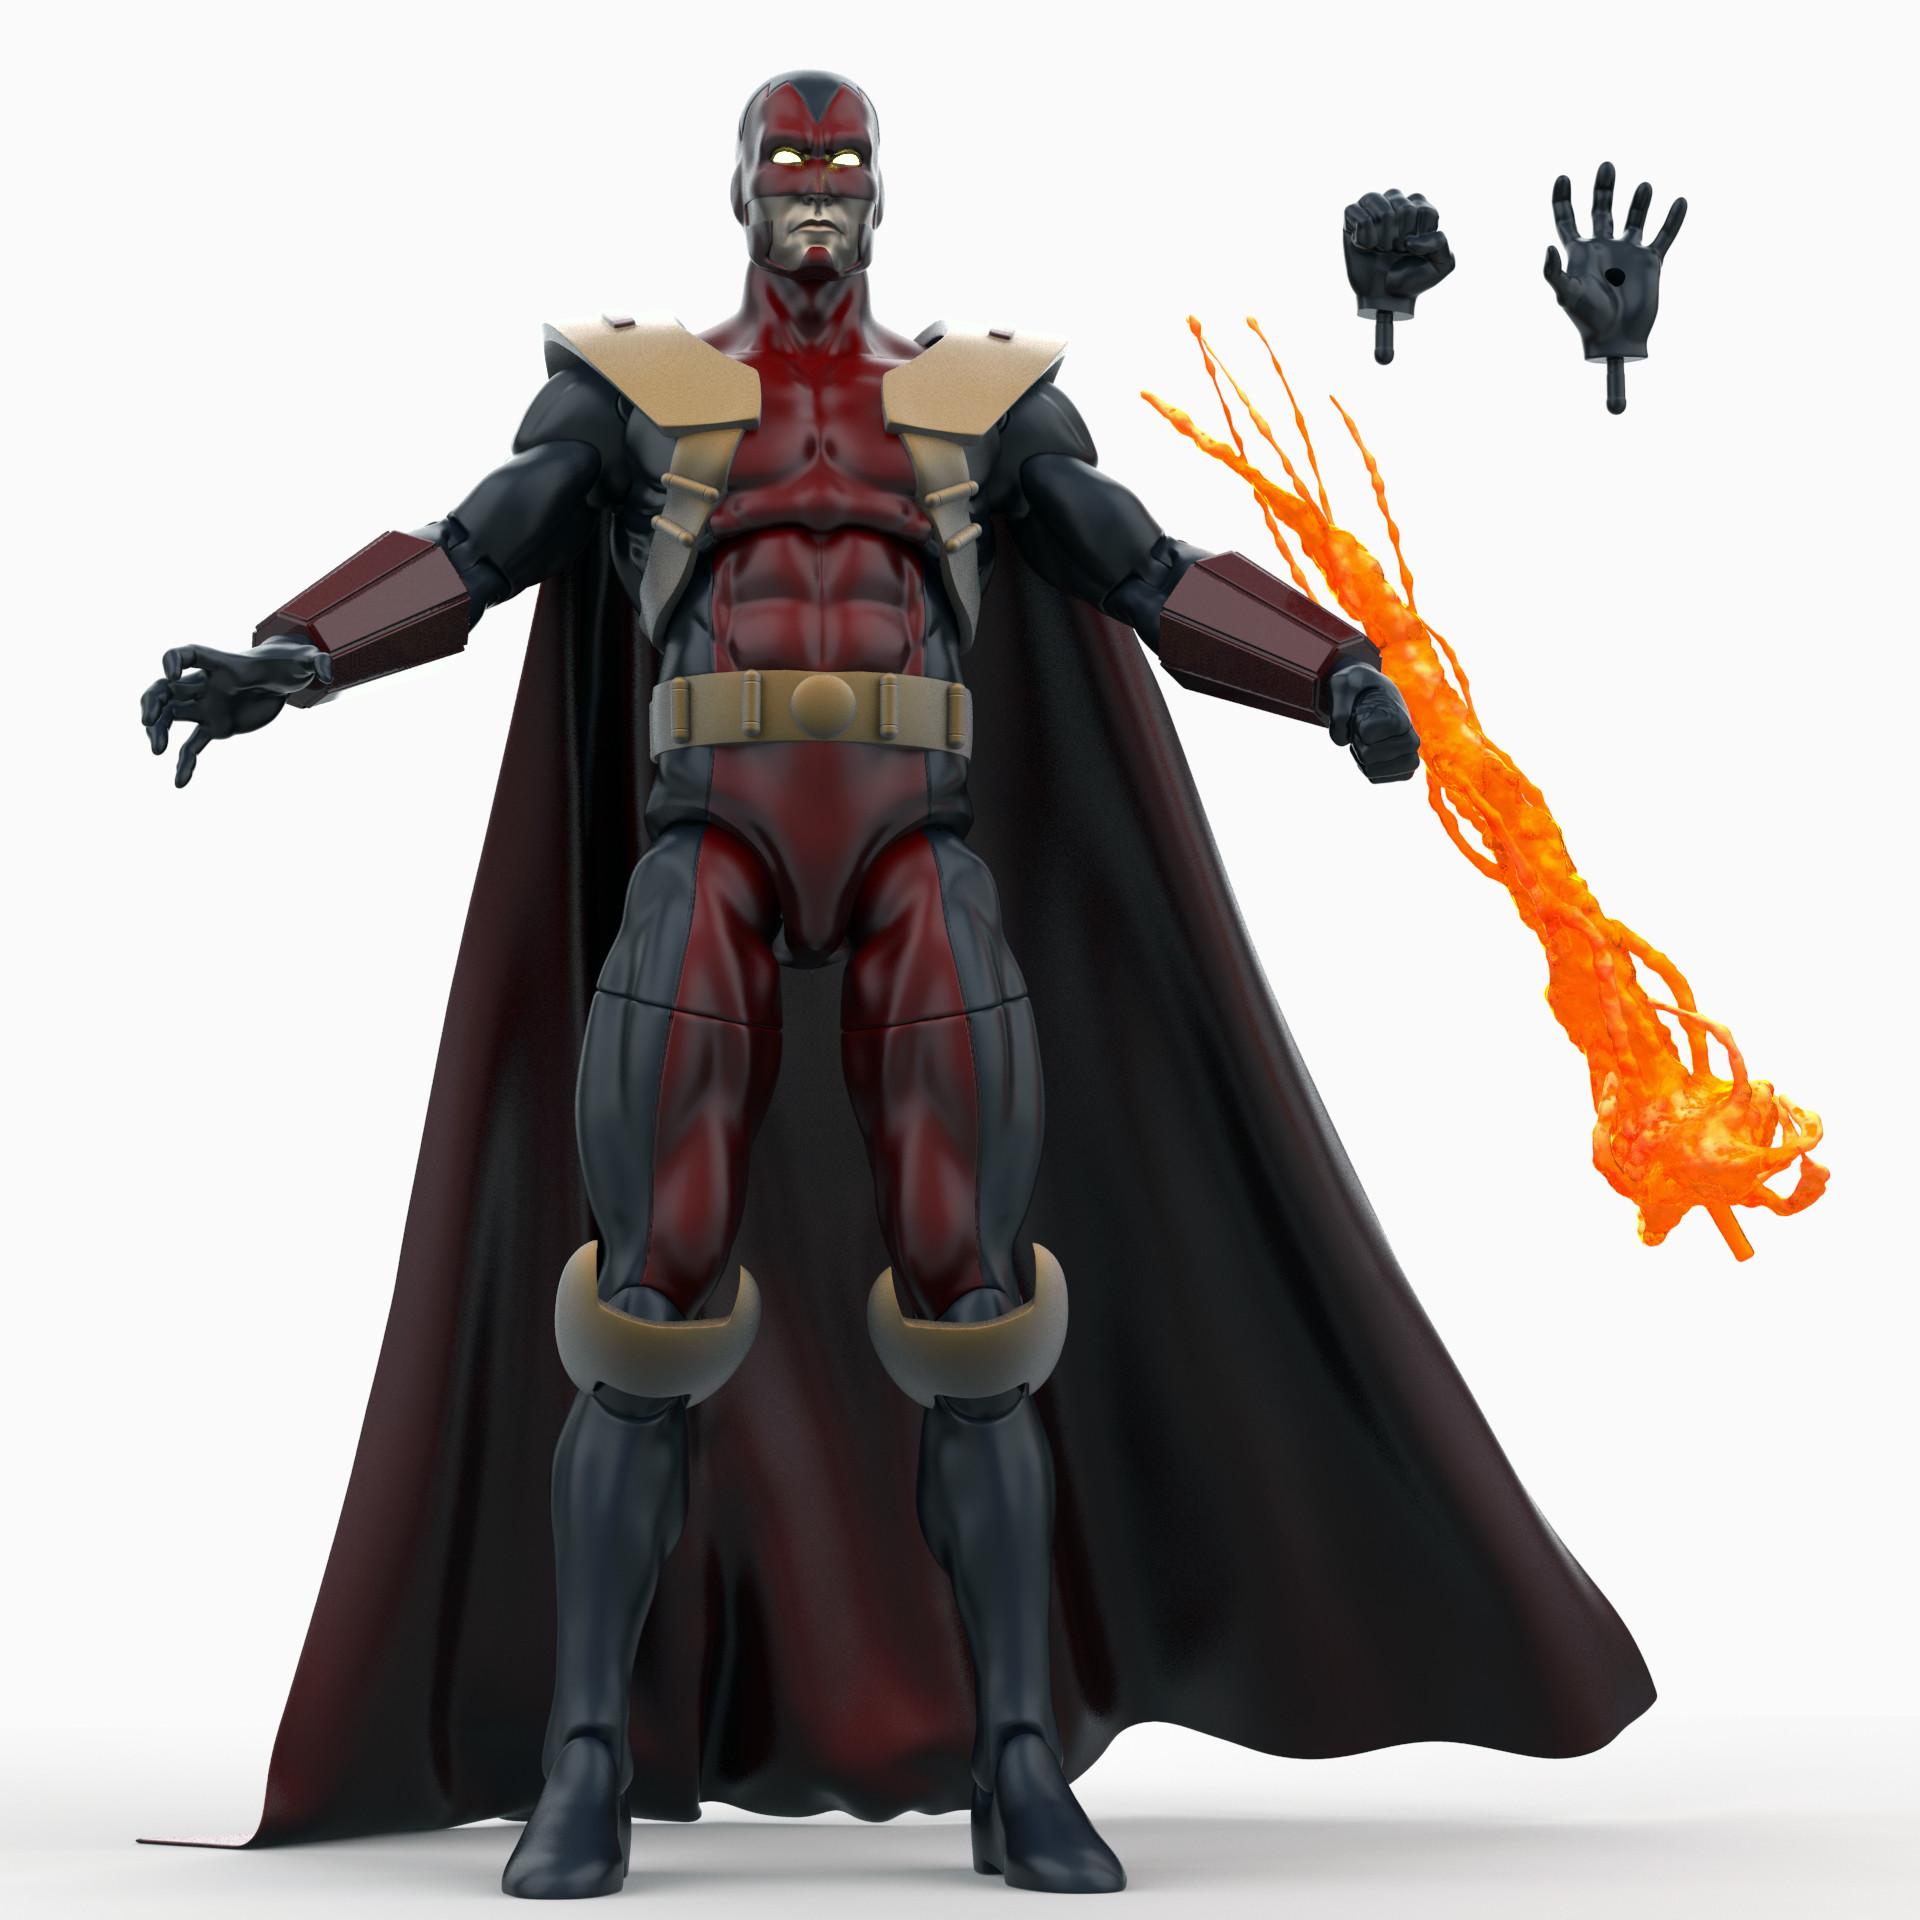 Ejay russell lord darkstar2 92